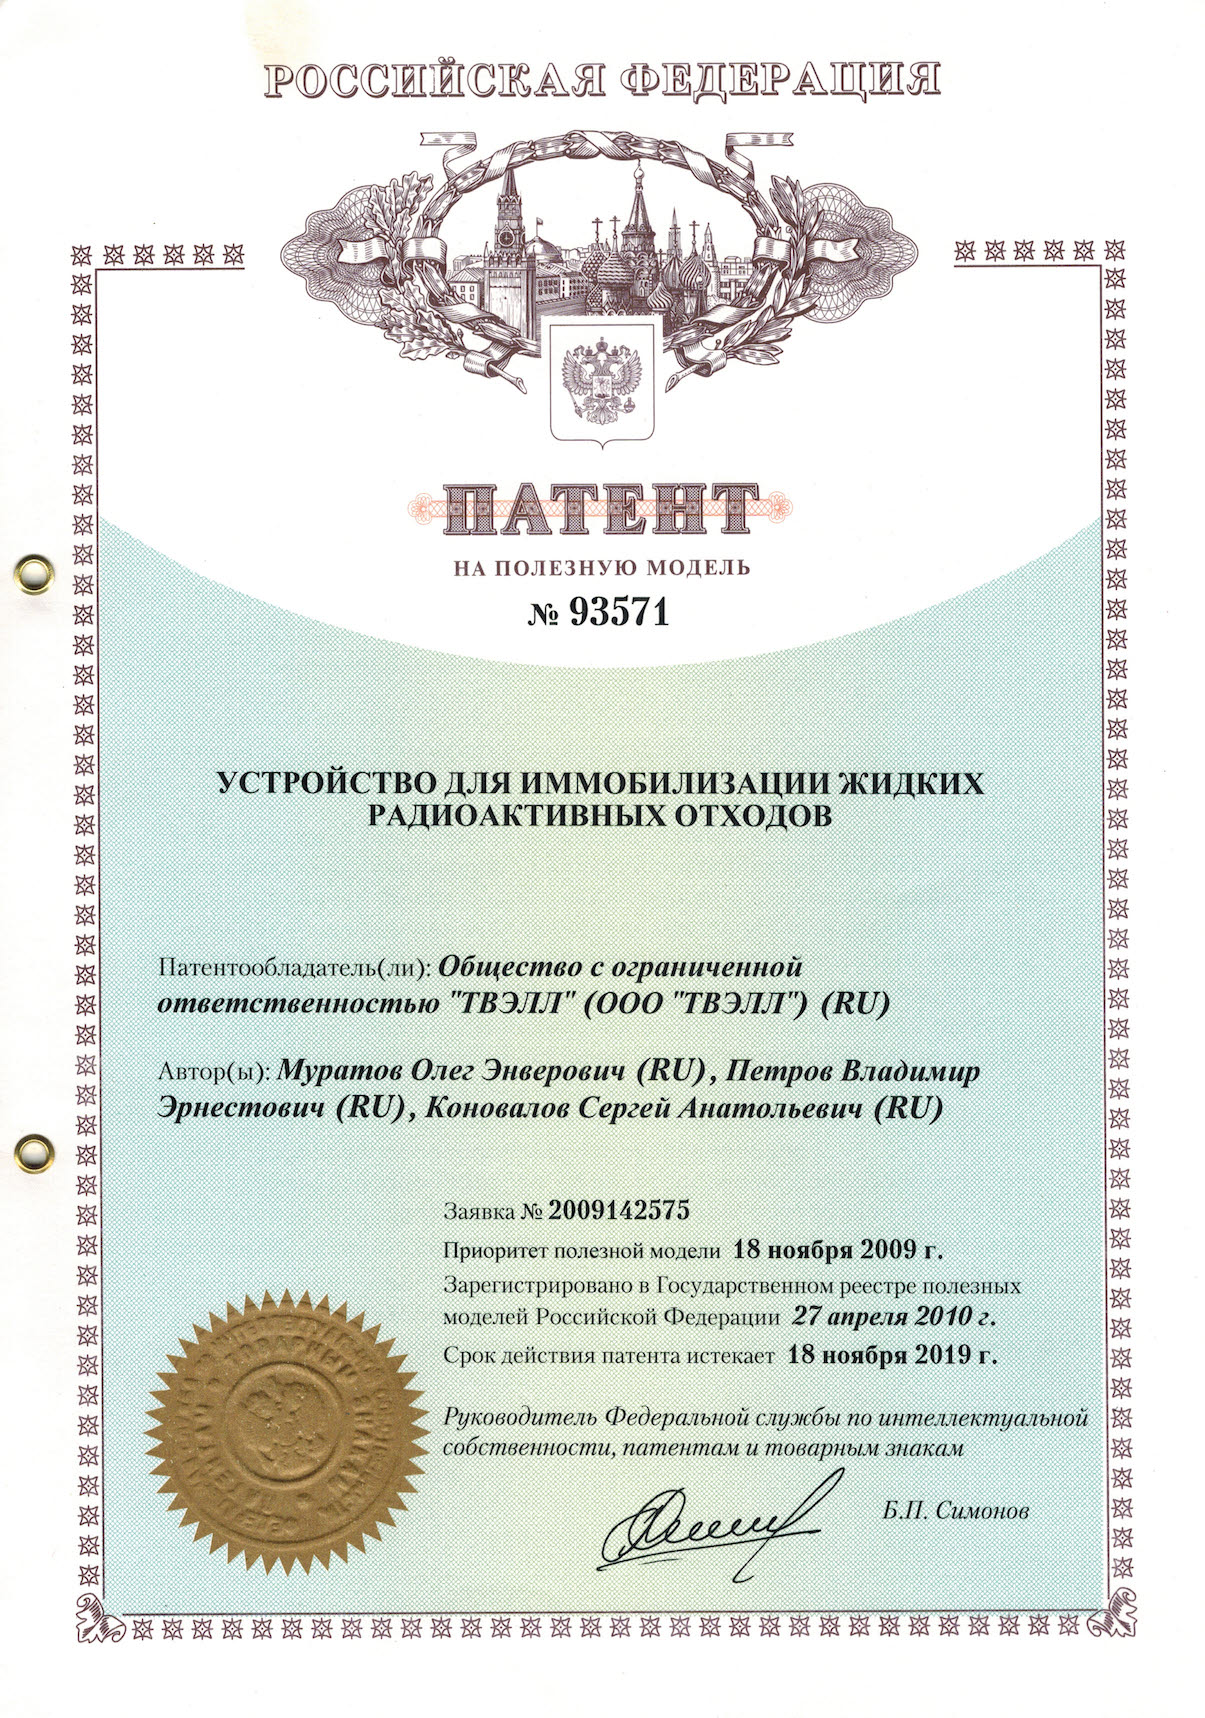 patent_RWimmo